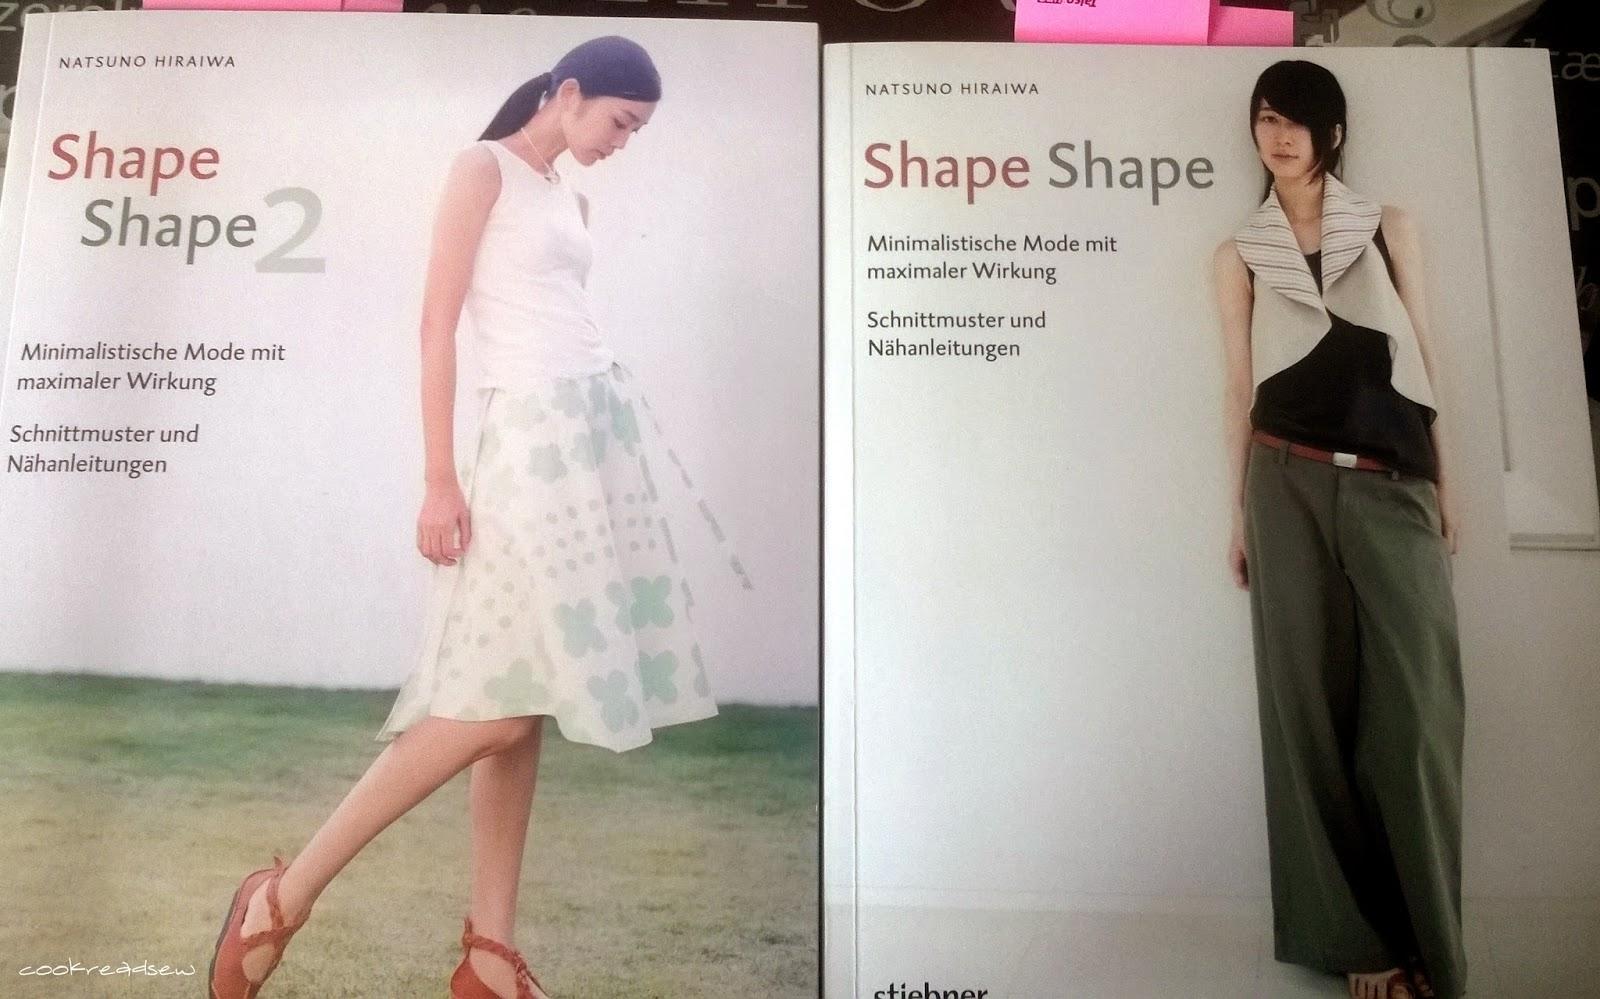 cookreadsew: Natsuno Hiraiwa: Shape Shape - 1 und 2